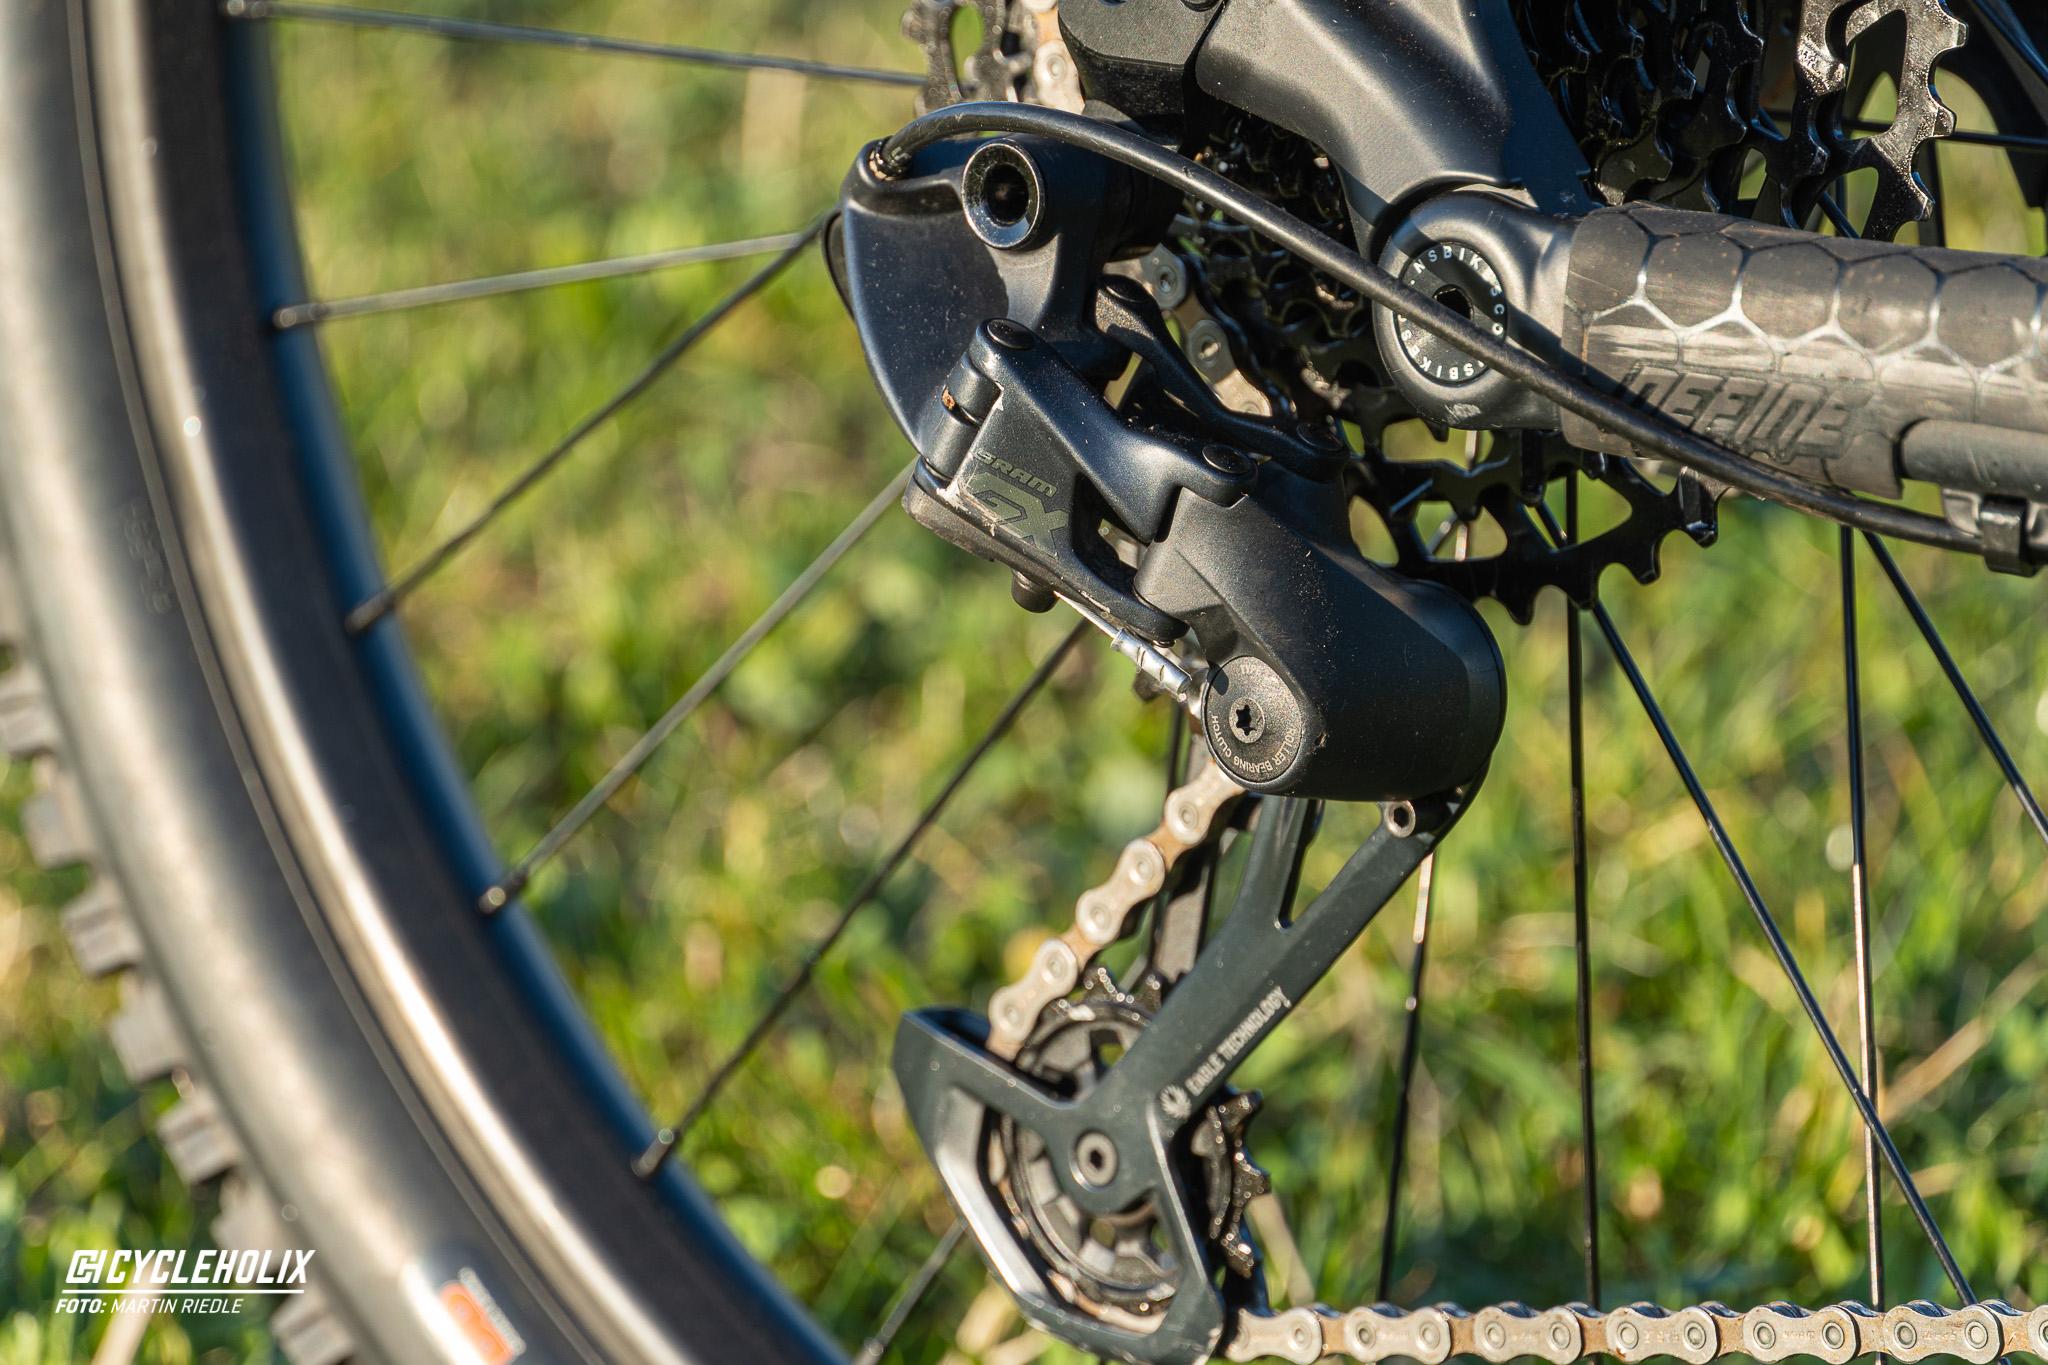 2021 NS Bikes Define 170 4 Cycleholix